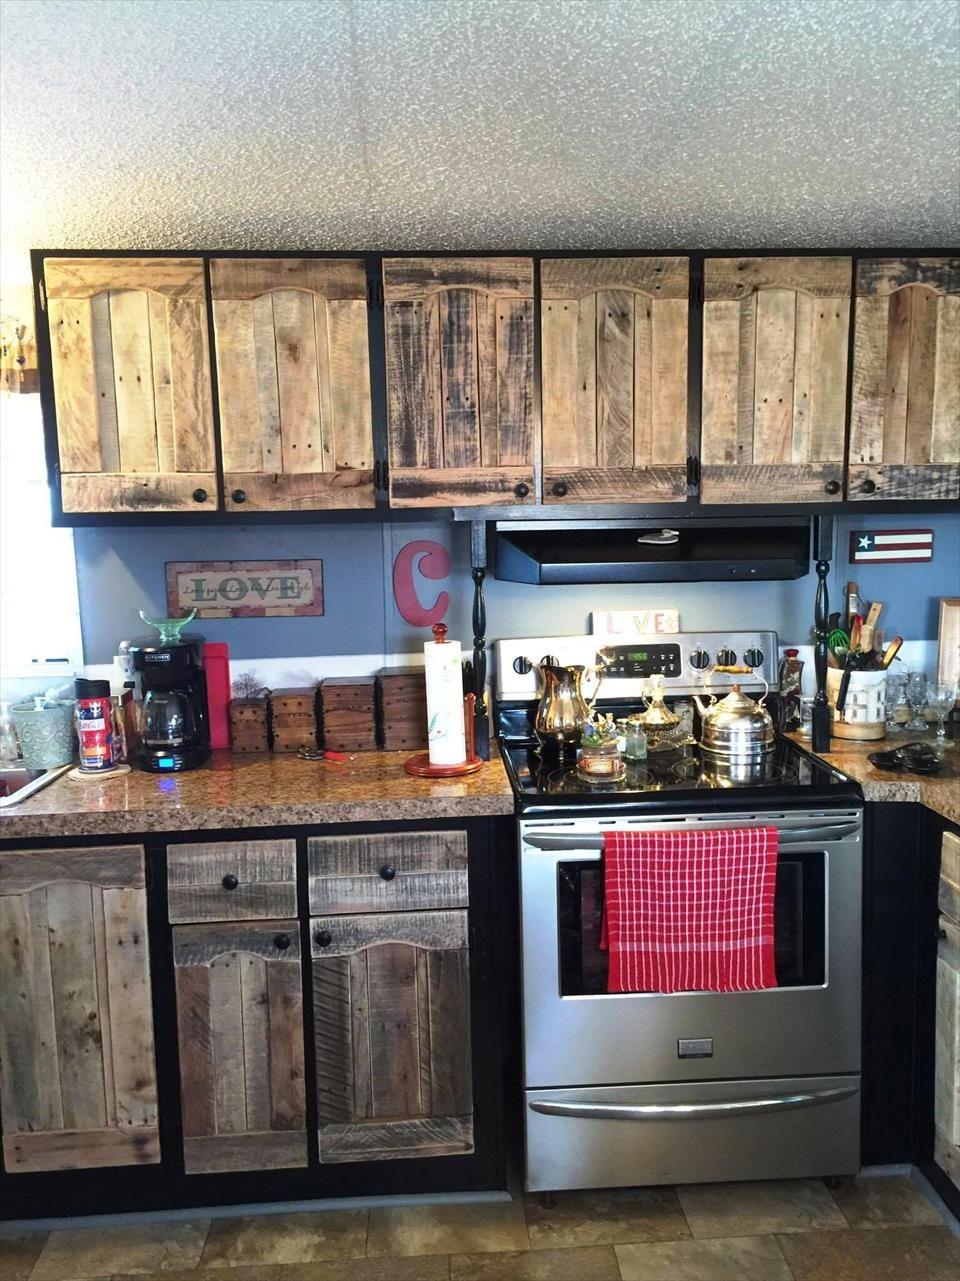 Improved Kitchen Cabinets Using Old Pallets Jpg 960 1281